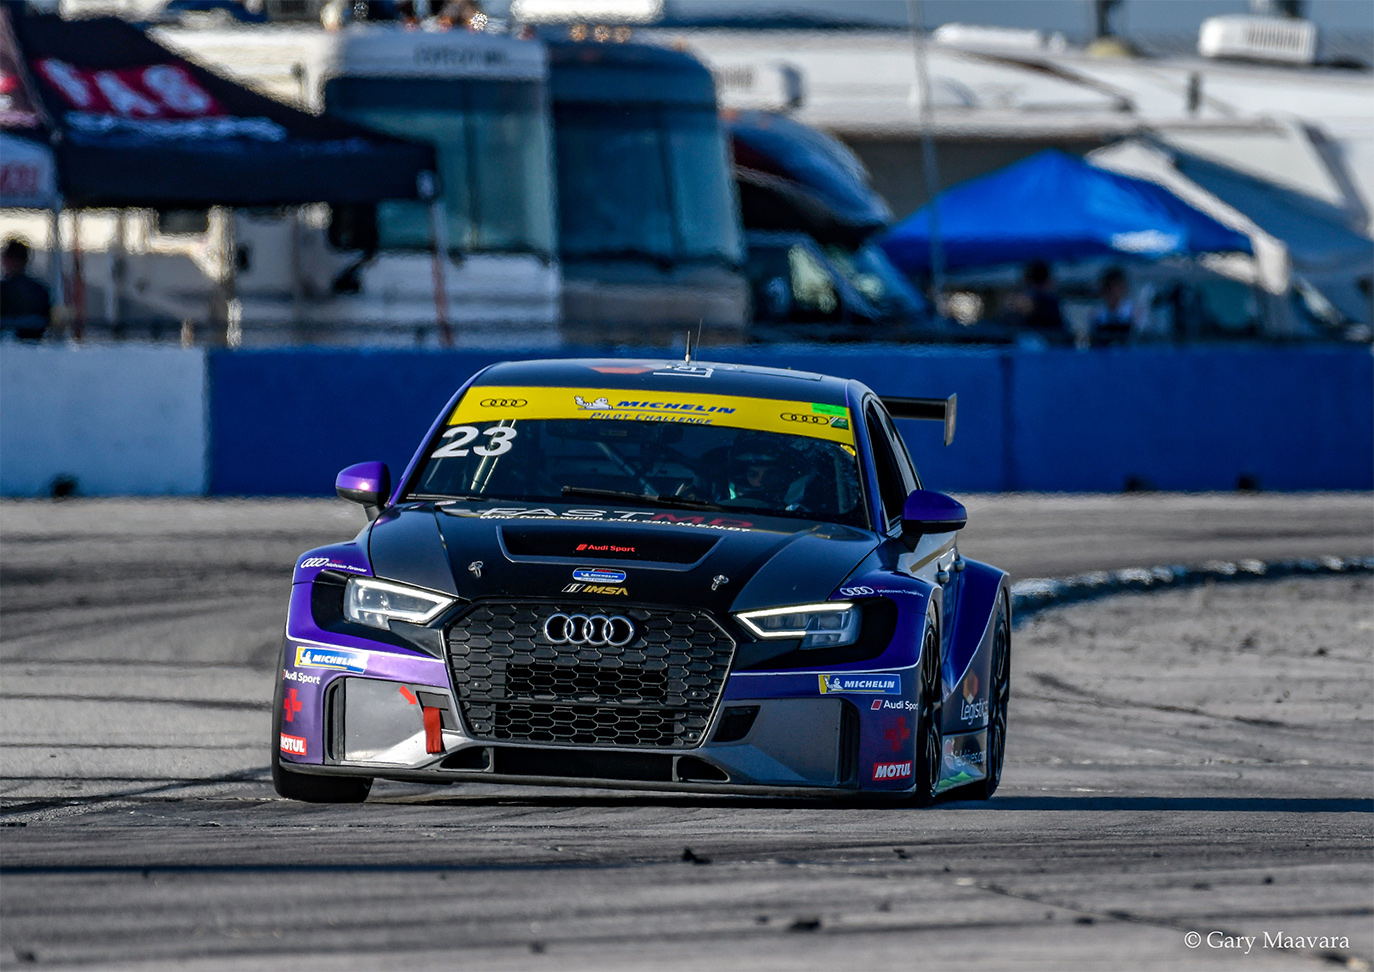 TrackWorthy - Michelin_qualifying_#23_Audi RS3 LMS TCR